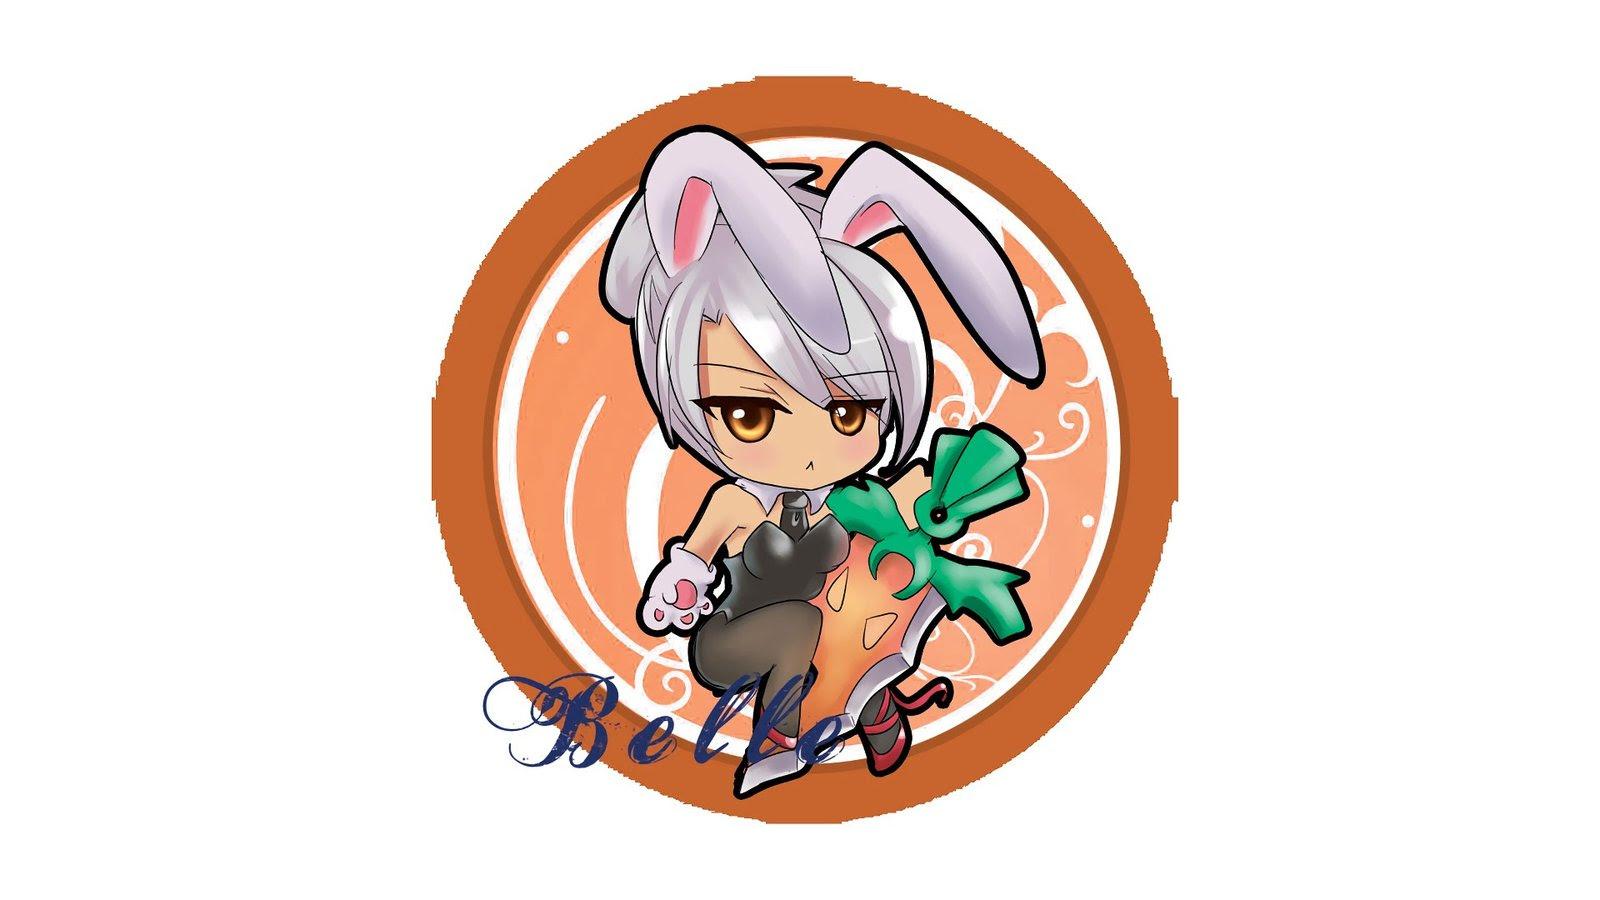 Chibi Battle Bunny Riven Wallpapers Fan Arts League Of